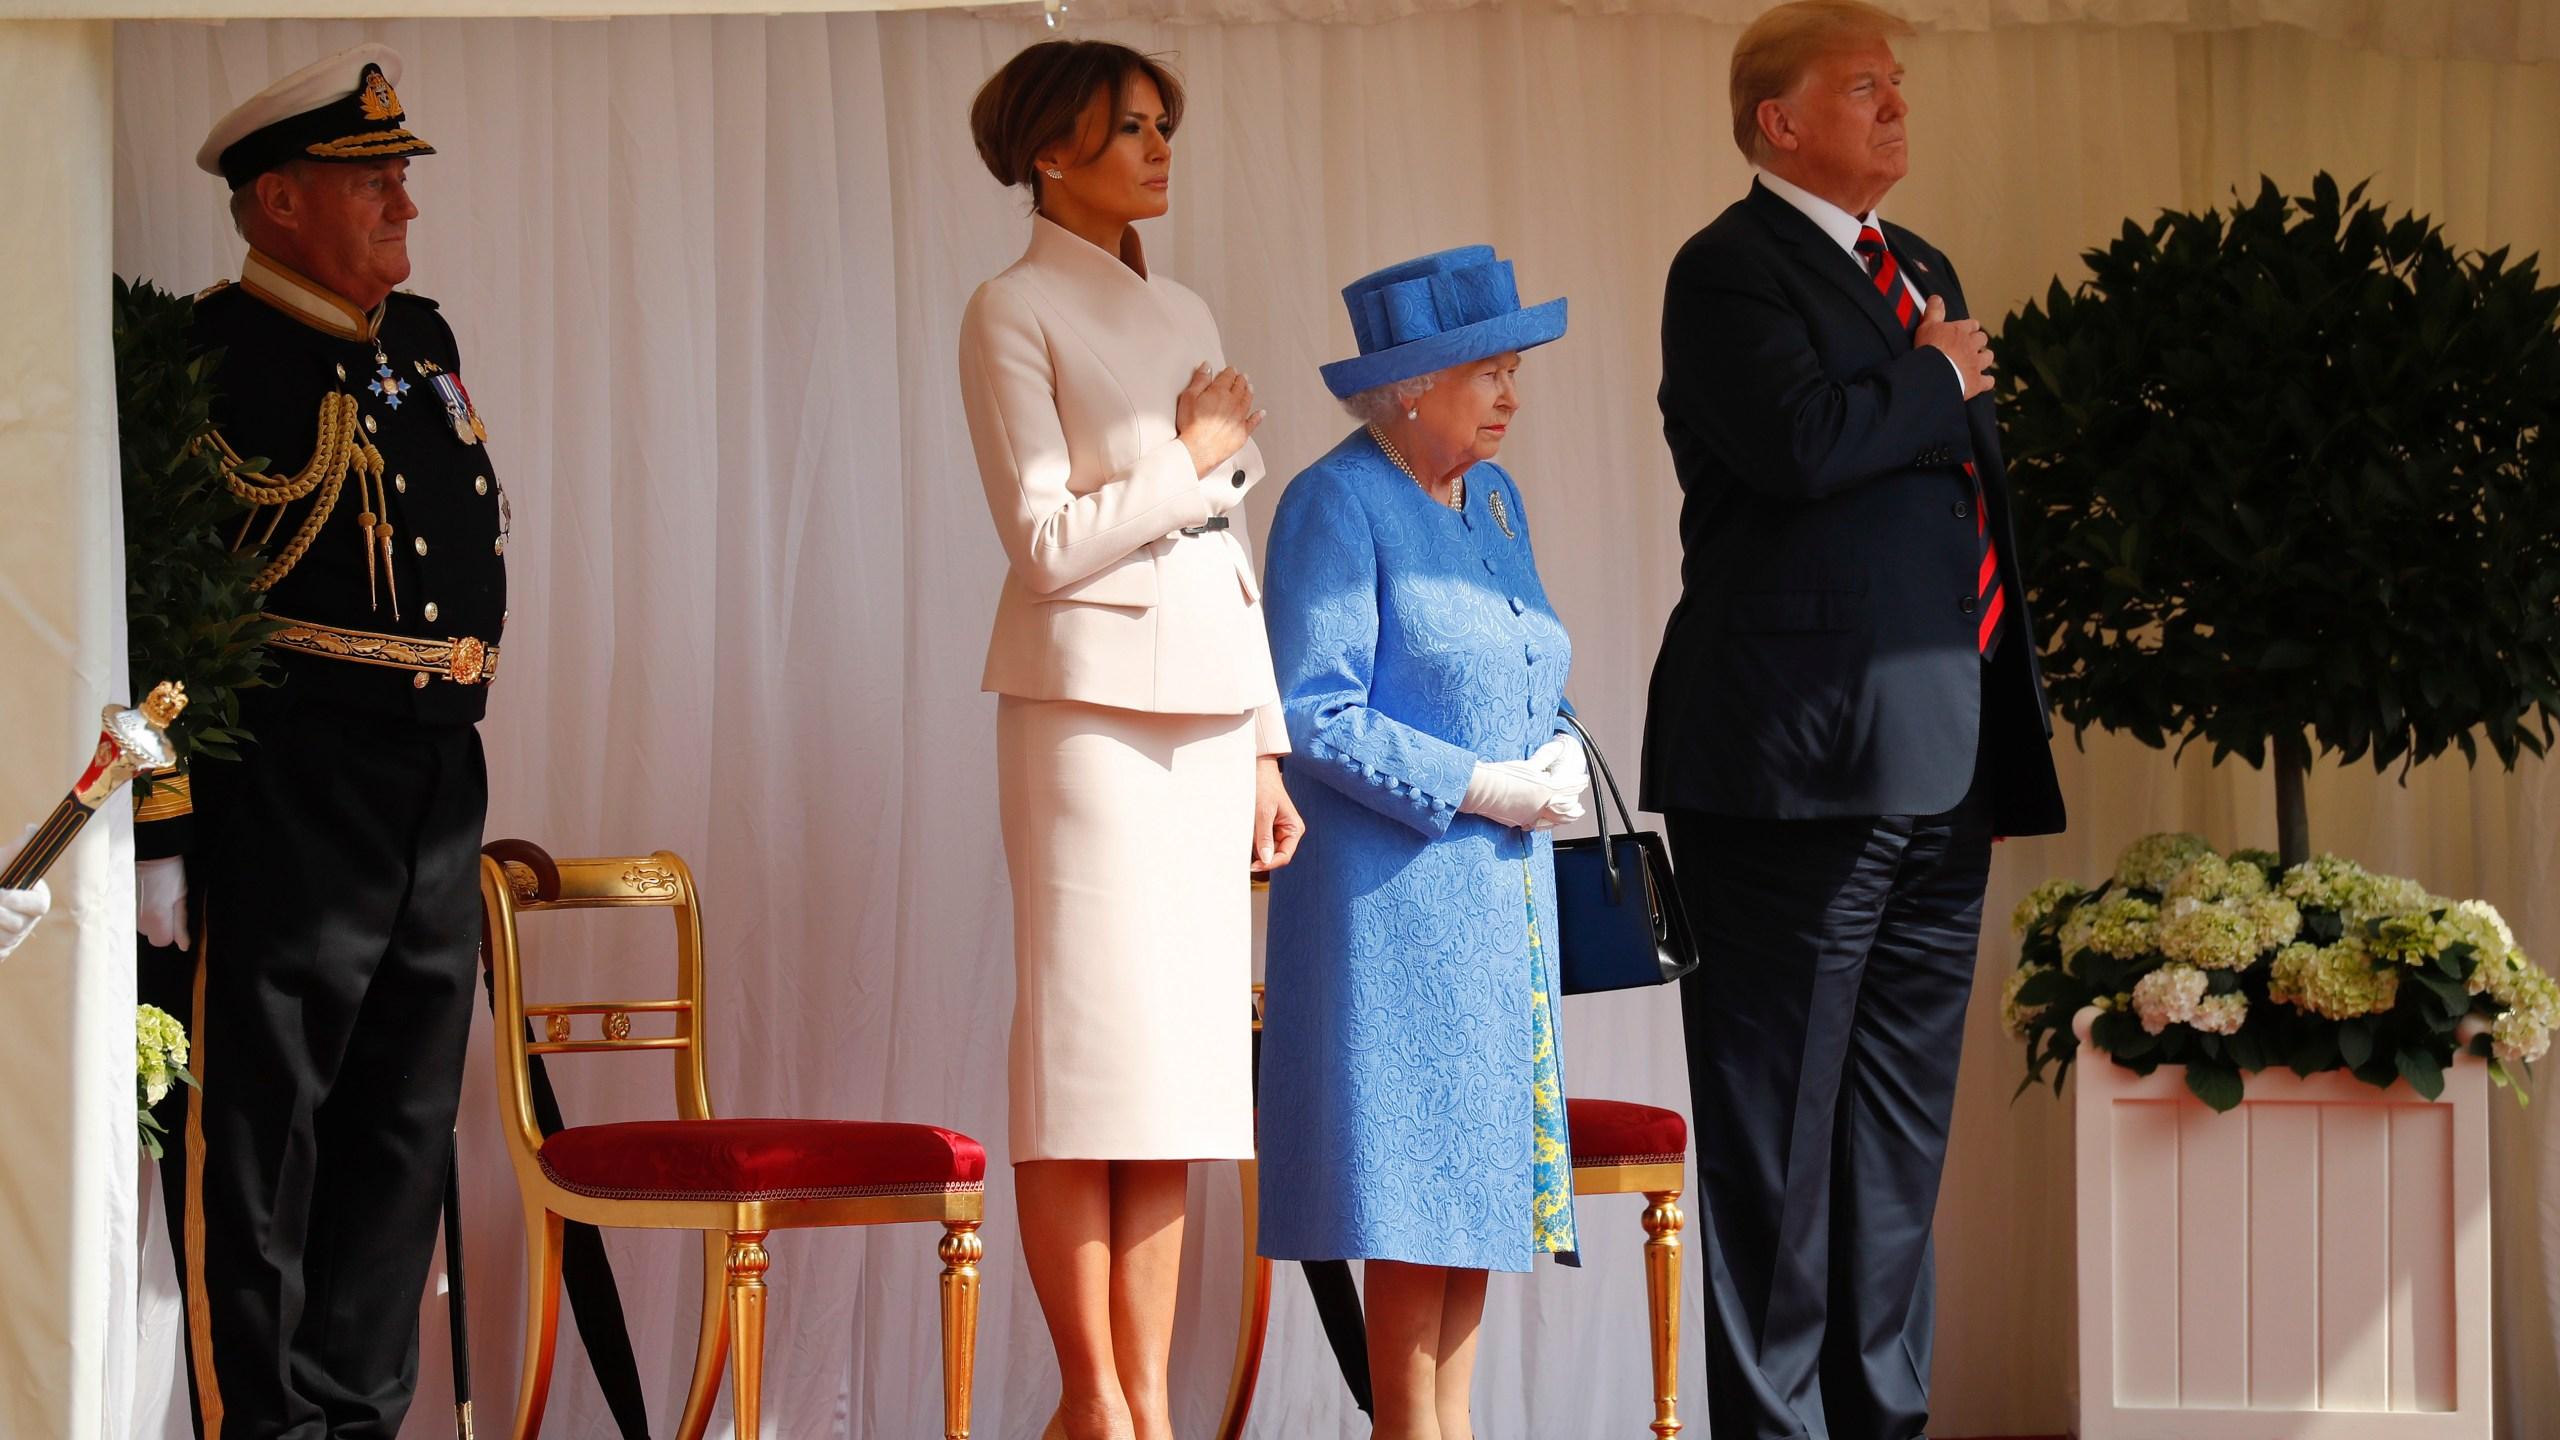 Britain_Trump_Visit_19830-159532.jpg66709255